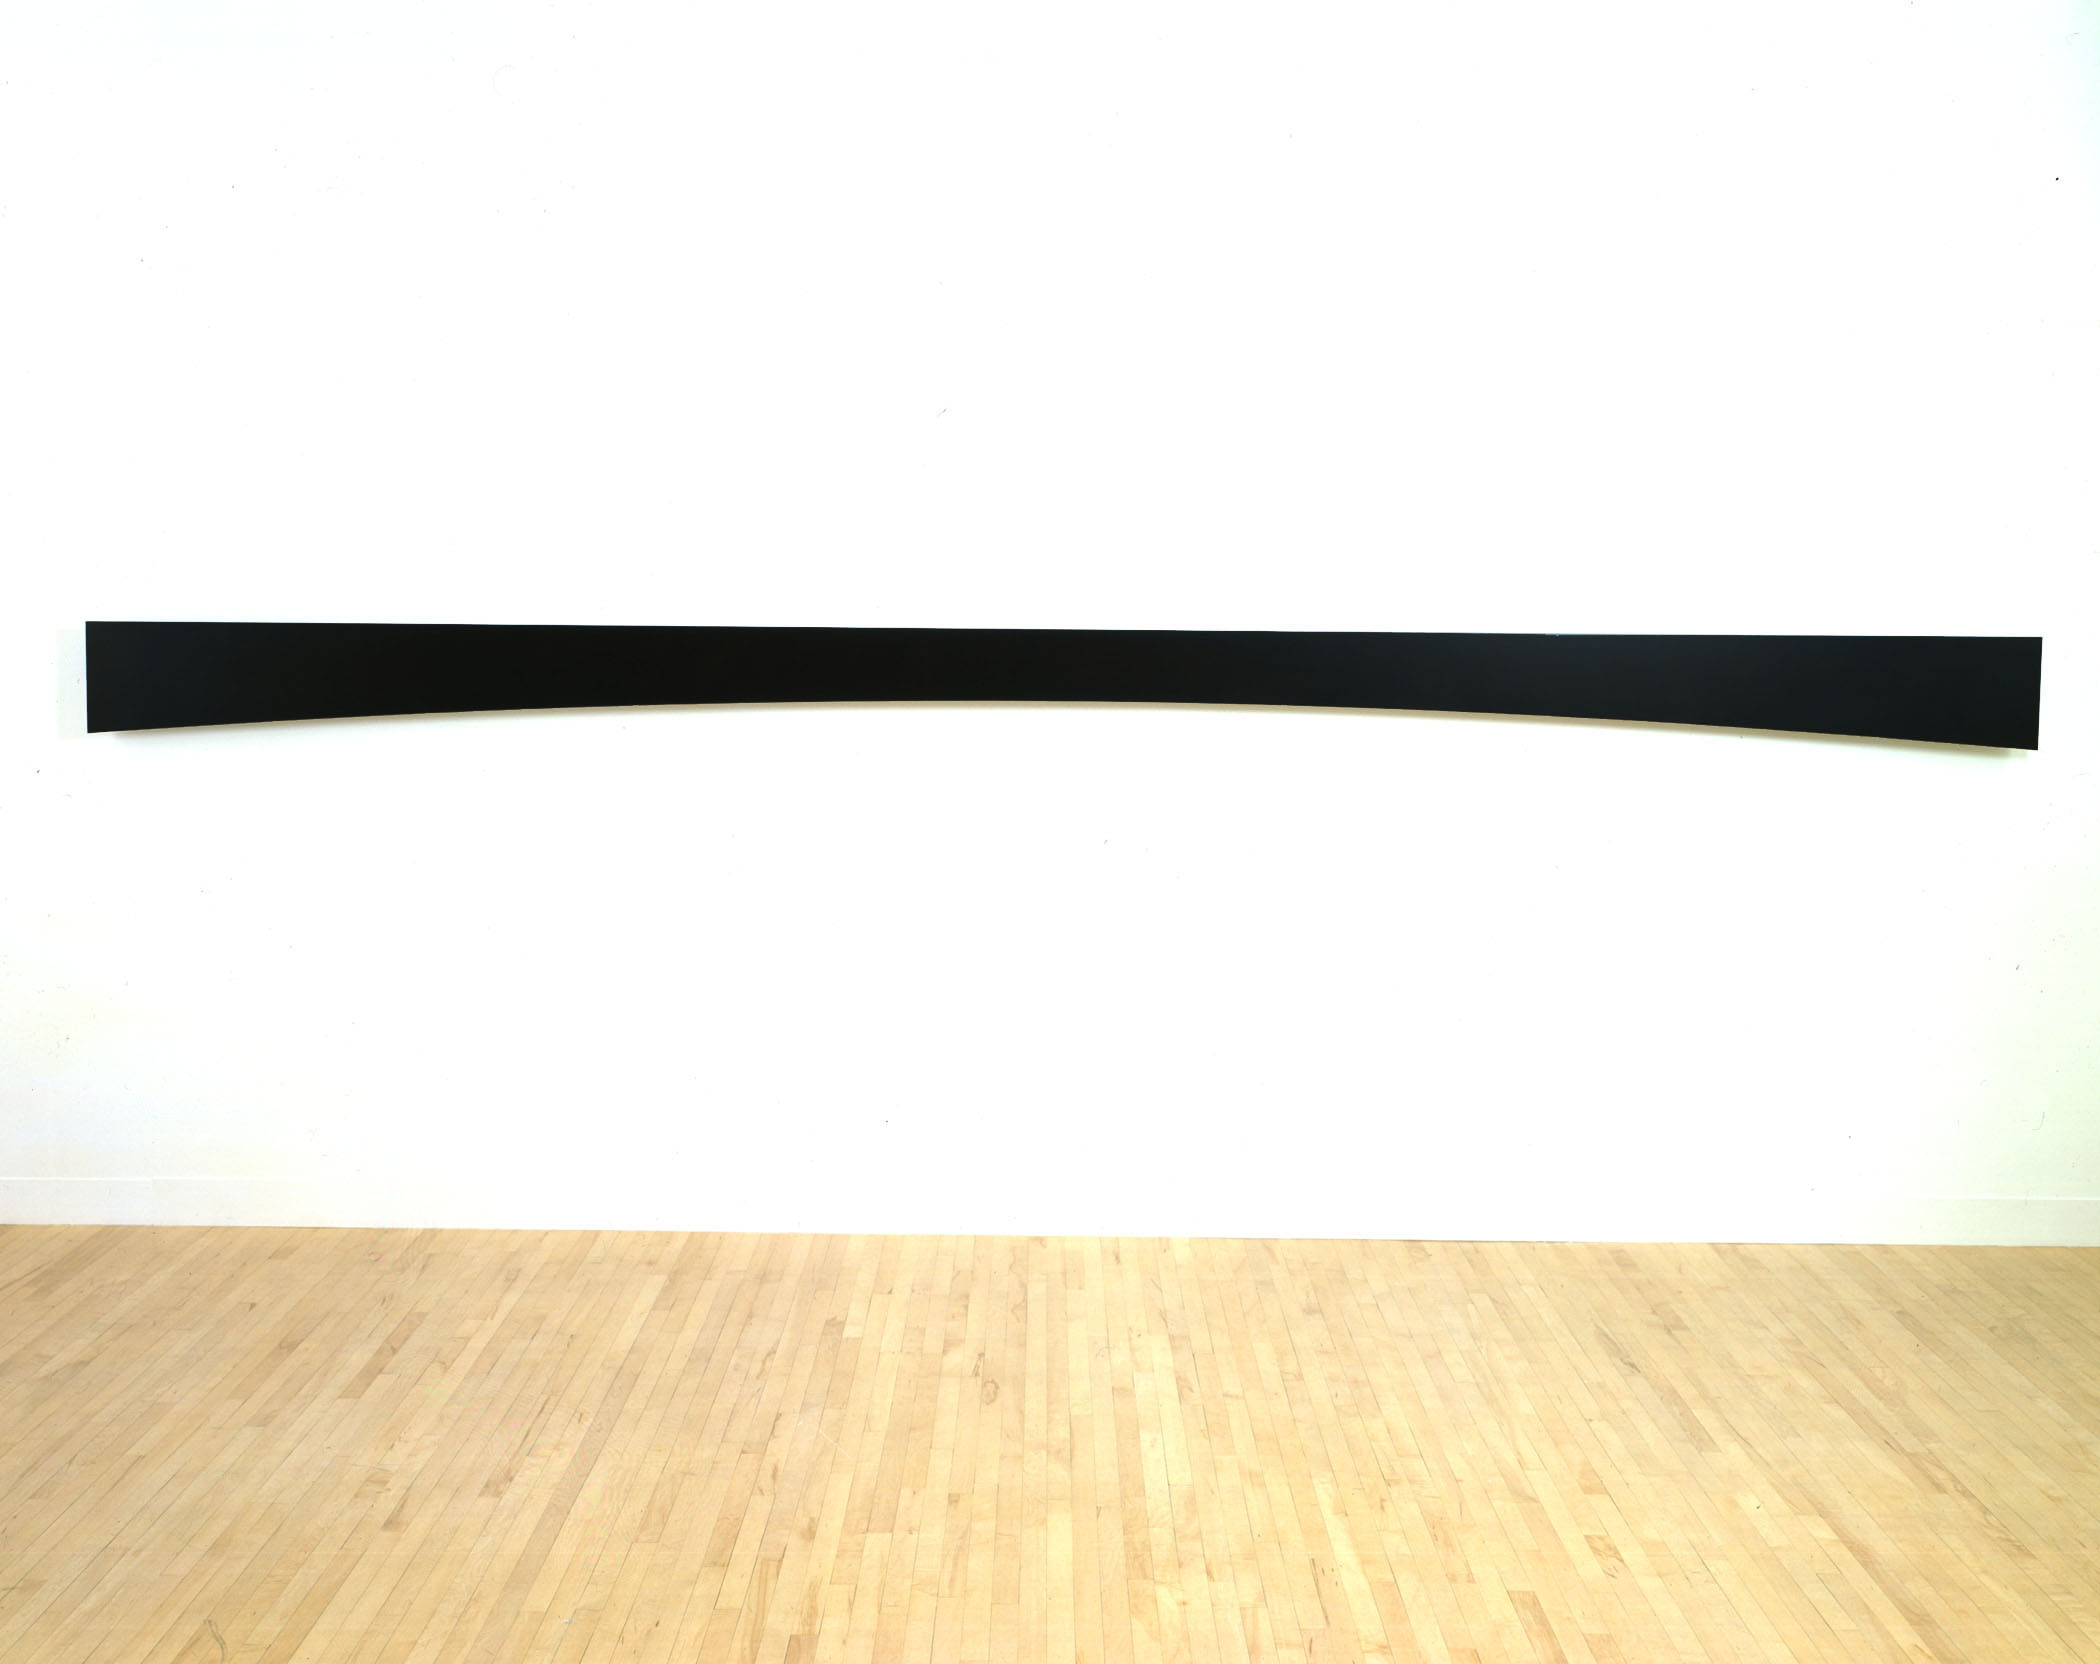 Ellsworth Kelly Horizontal Curve 1996 (EK868) Bronze (patina black)  14 x 240 x 1.25 inches      View More Ellsworth Kelly